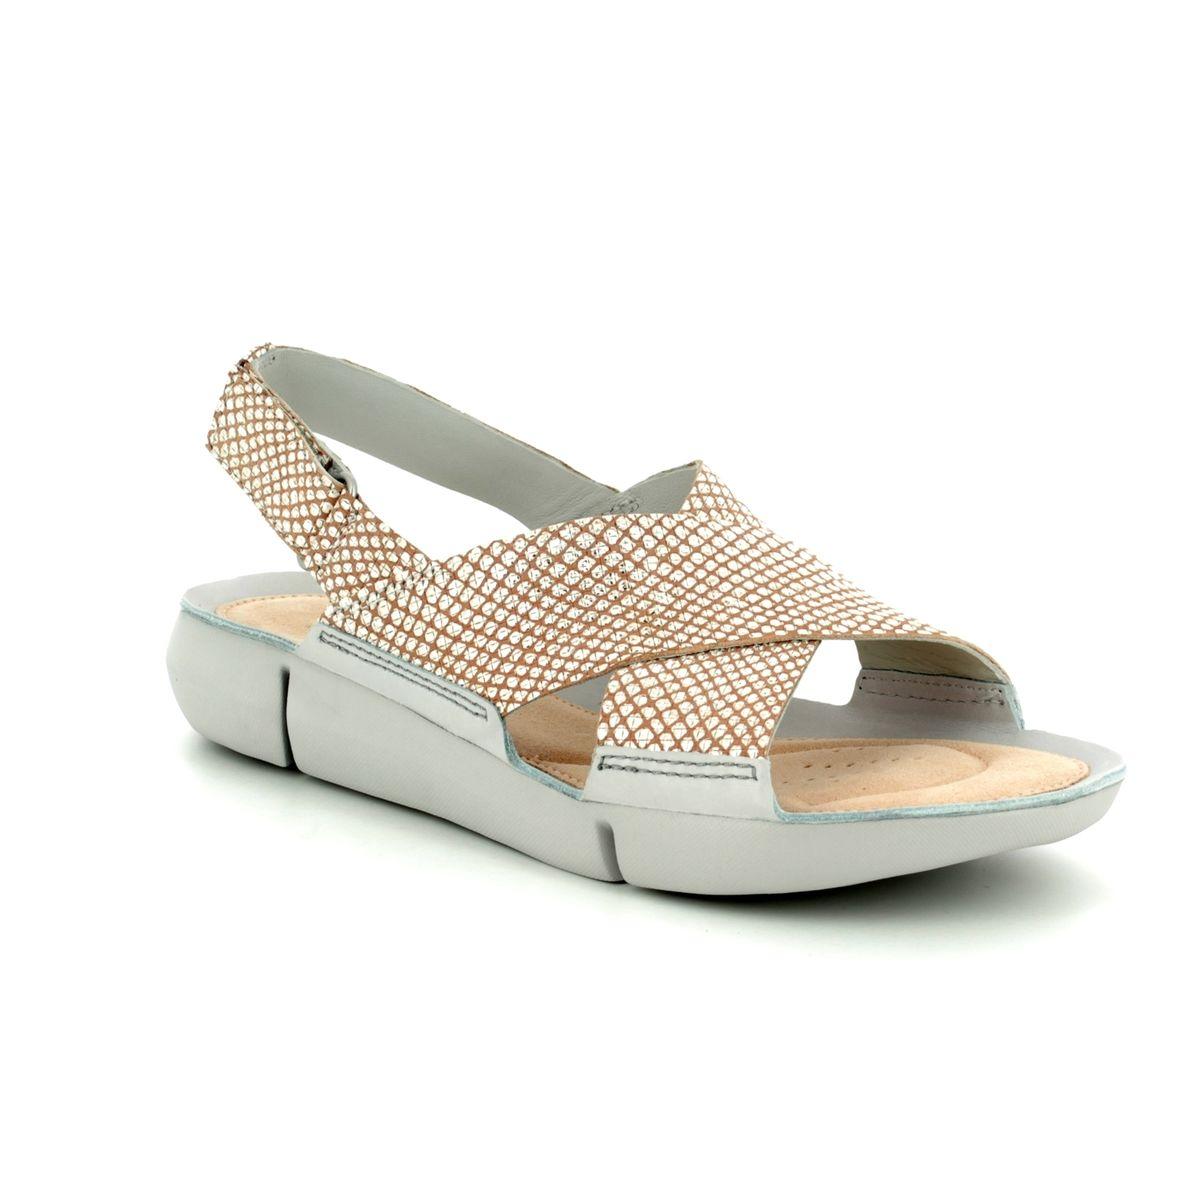 1c29b40aa861 Clarks Sandals - Silver multi - 3129 44D TRI CHLOE